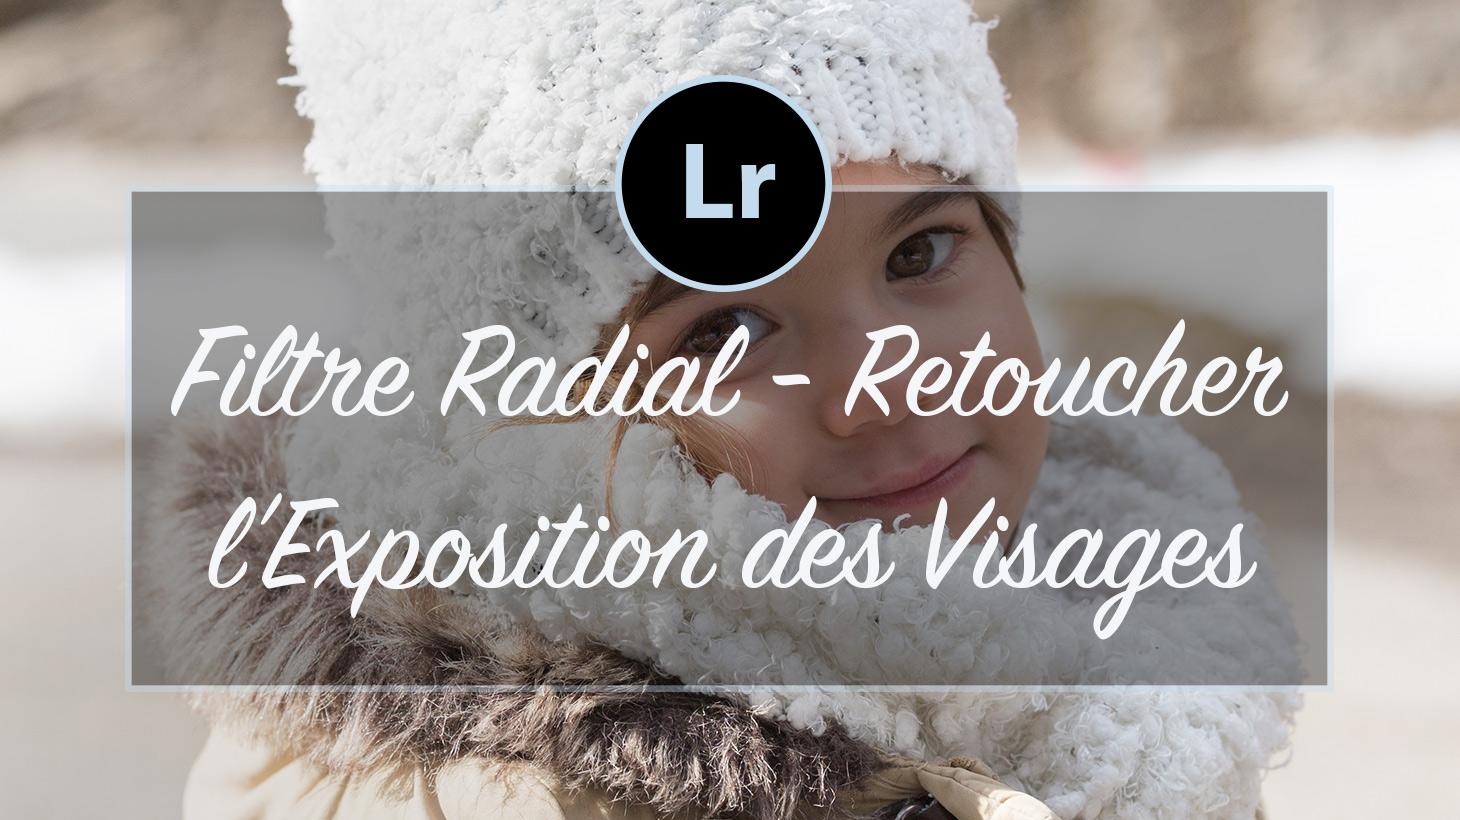 Filtre Radial Lightroom – Retoucher avec soin l'exposition des visages (37/52)